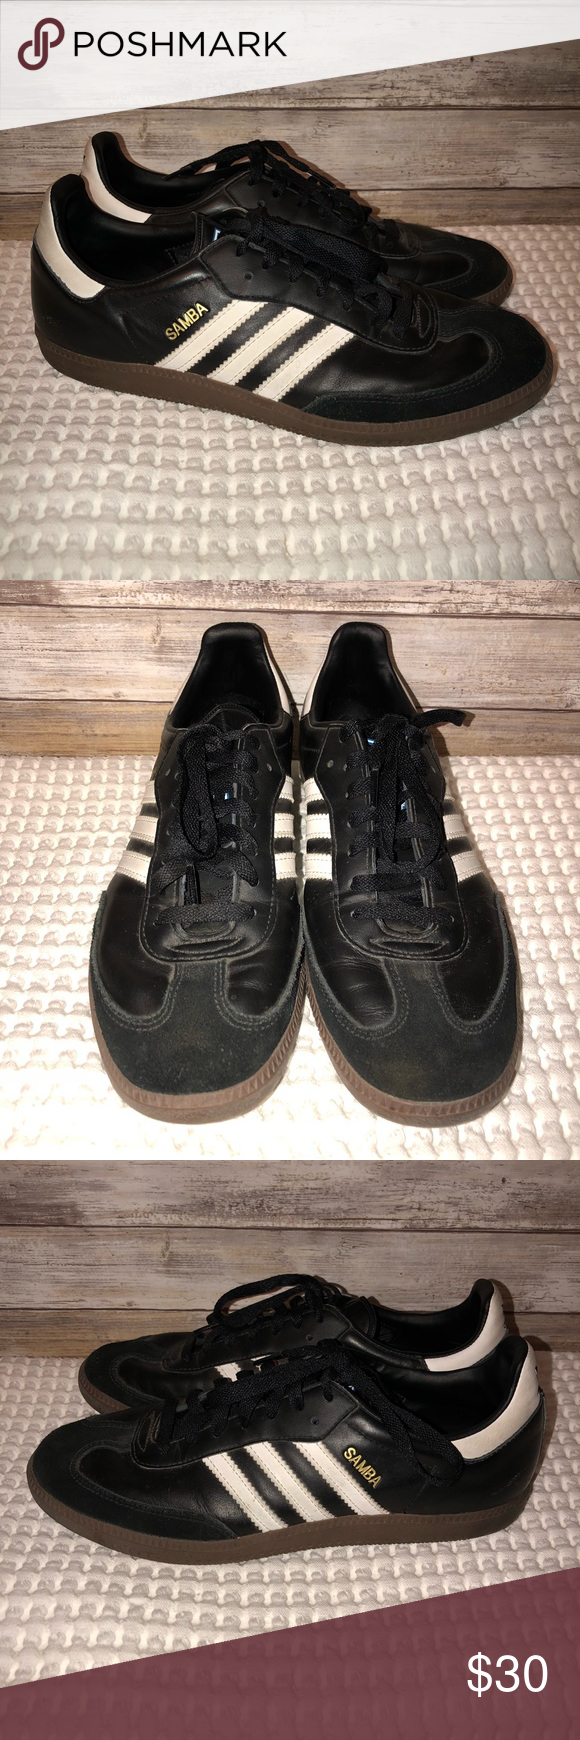 adidas samba classico scarpe adidas samba classico nero indoor